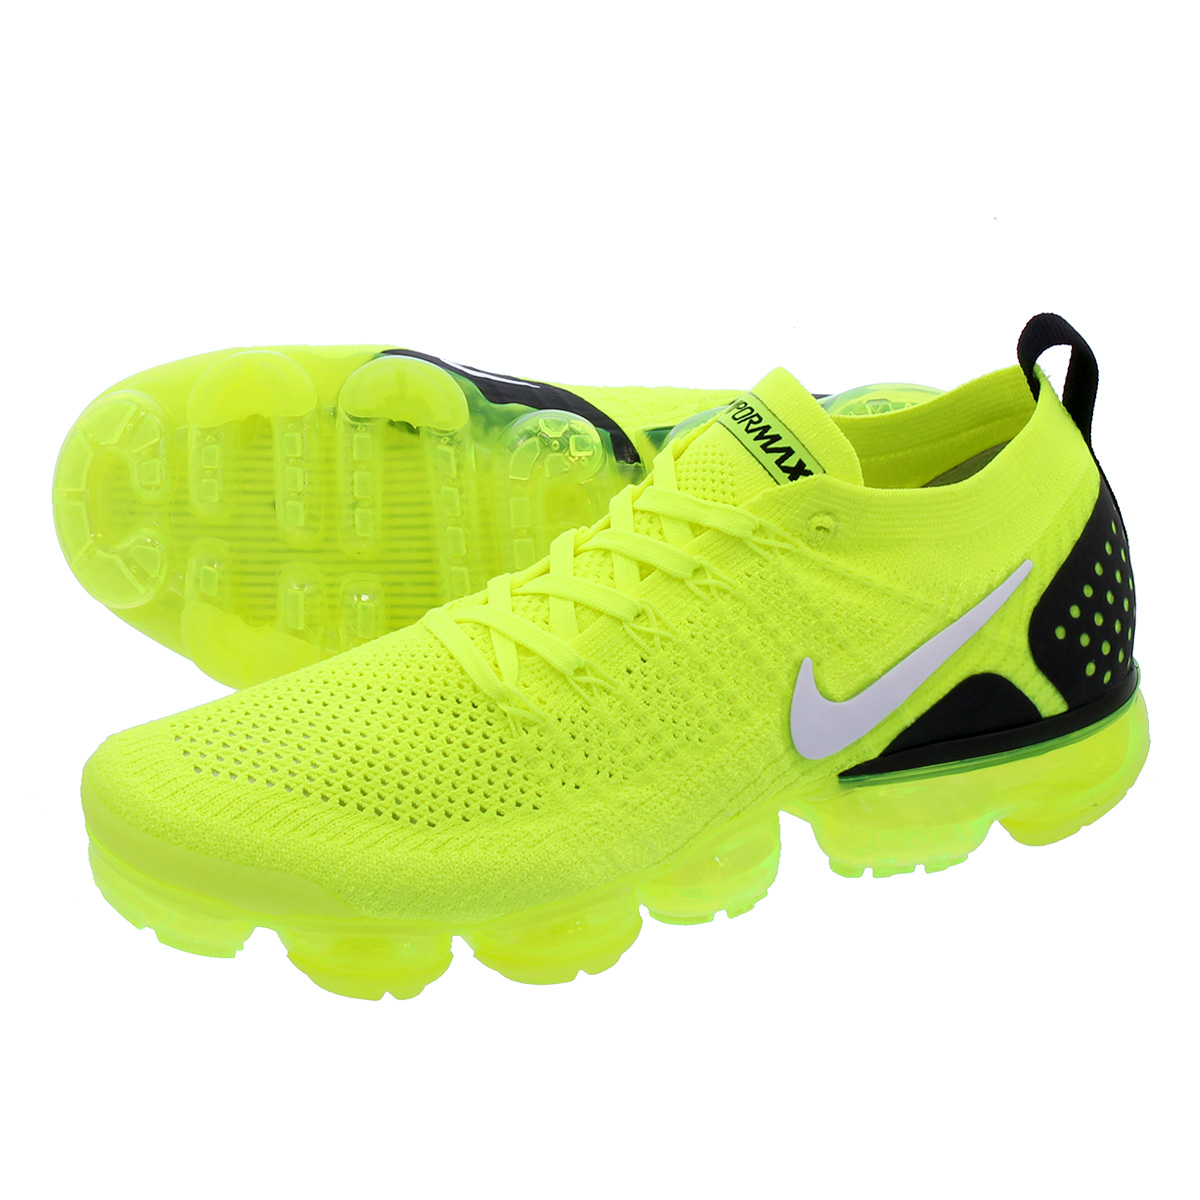 huge discount 0b739 3e1ca NIKE AIR VAPORMAX FLYKNIT 2 Nike vapor max fried food knit 2 VOLT/BLACK  942,842-700